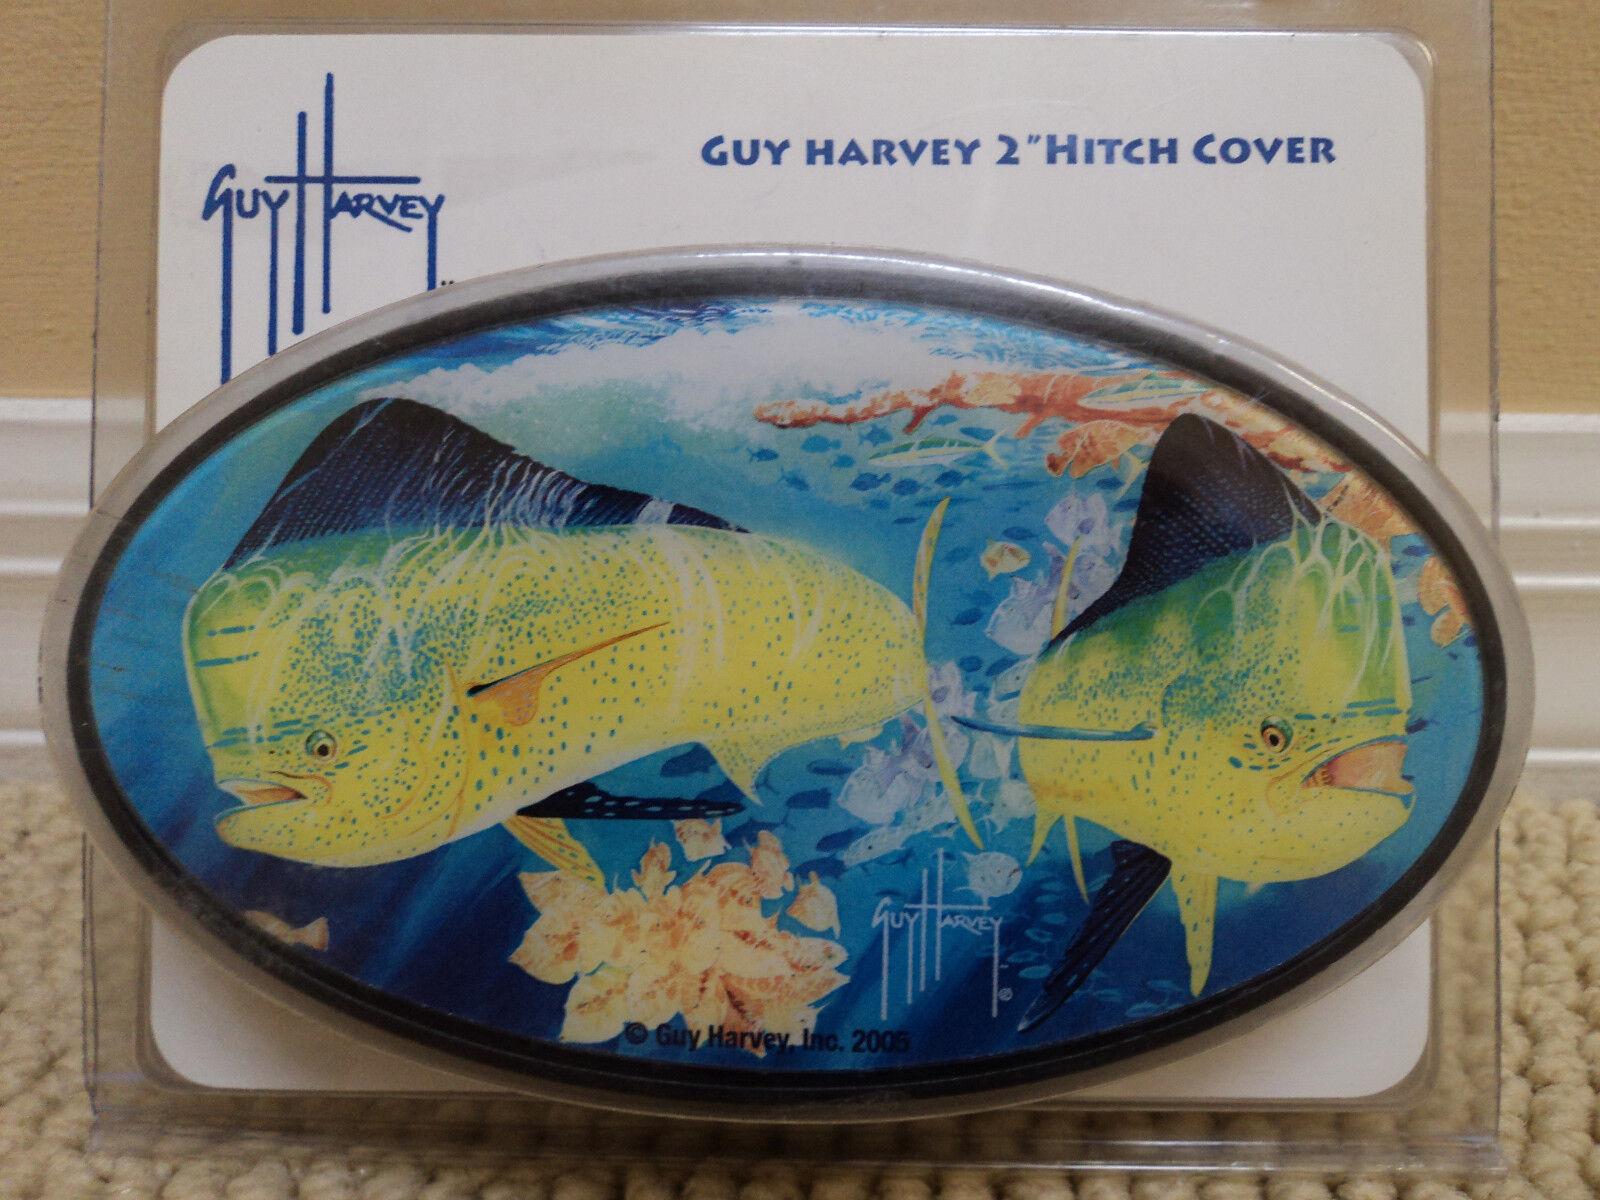 Nip guy harvey dorado dolphin mahi fish trailer hitch for Fish hitch cover